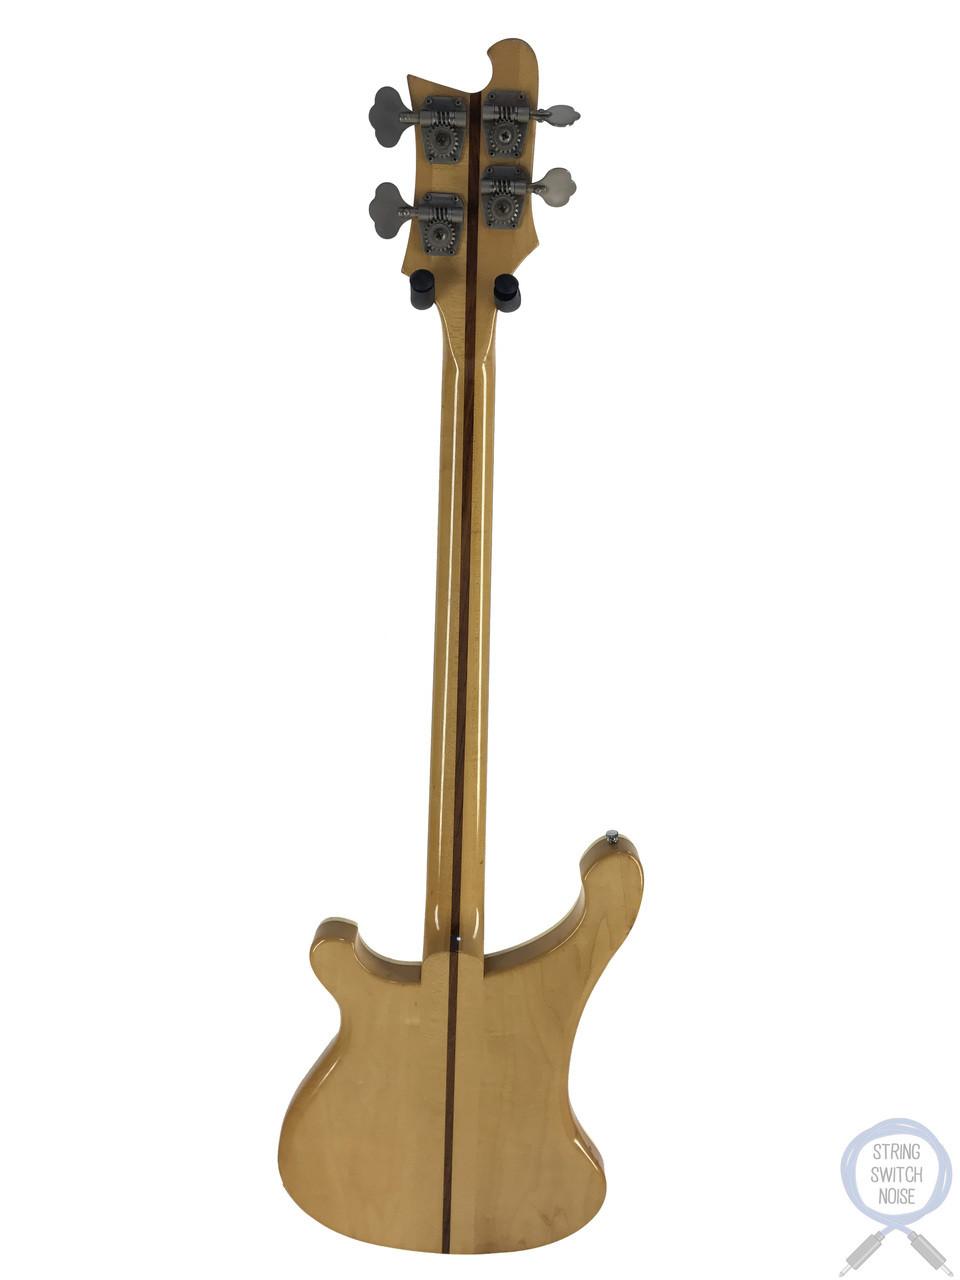 hight resolution of rickenbacker 4001 bass usa 1978 vintage mapleglo original hard case